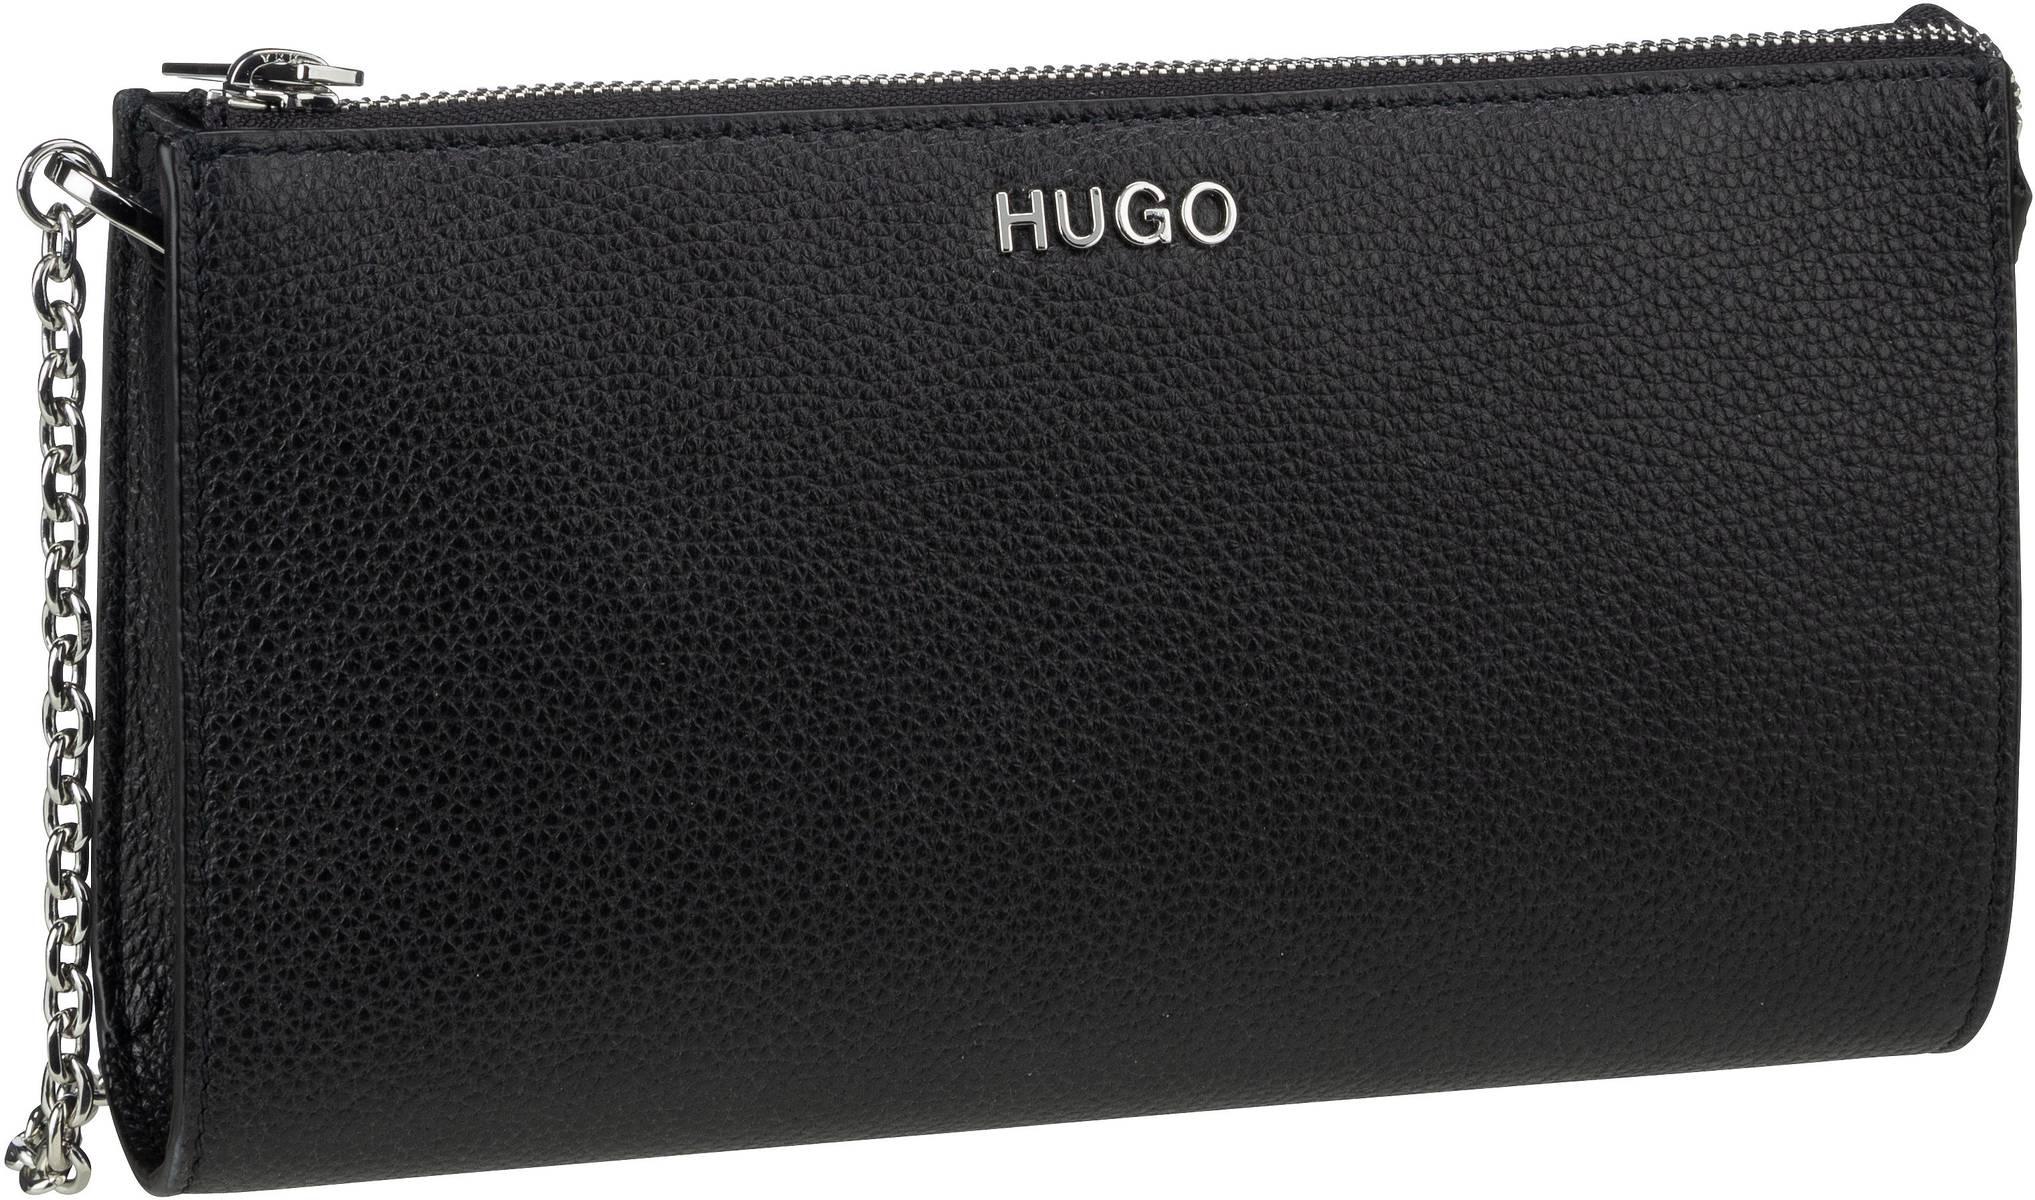 HUGO Umhängetasche Victoria Mini Bag 428525 Black